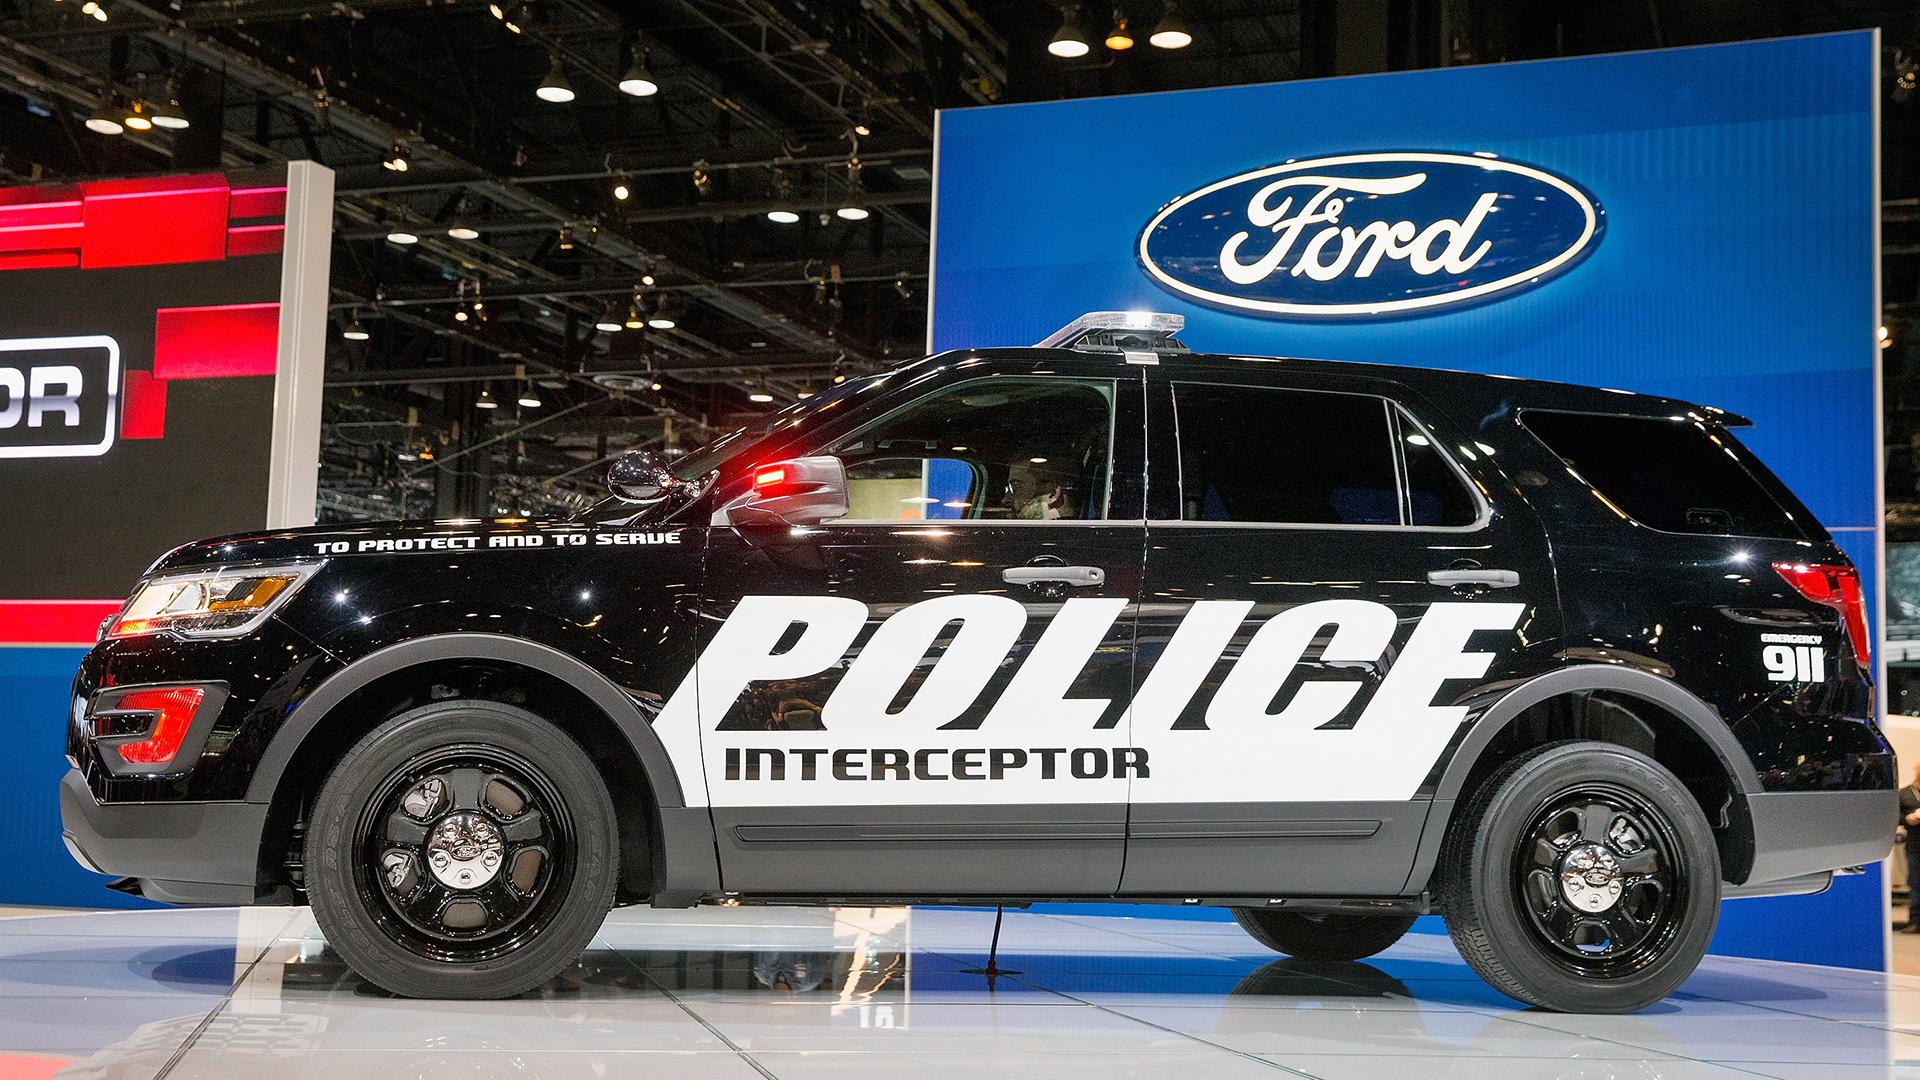 Ford Police Interceptor-159532.jpg91527983